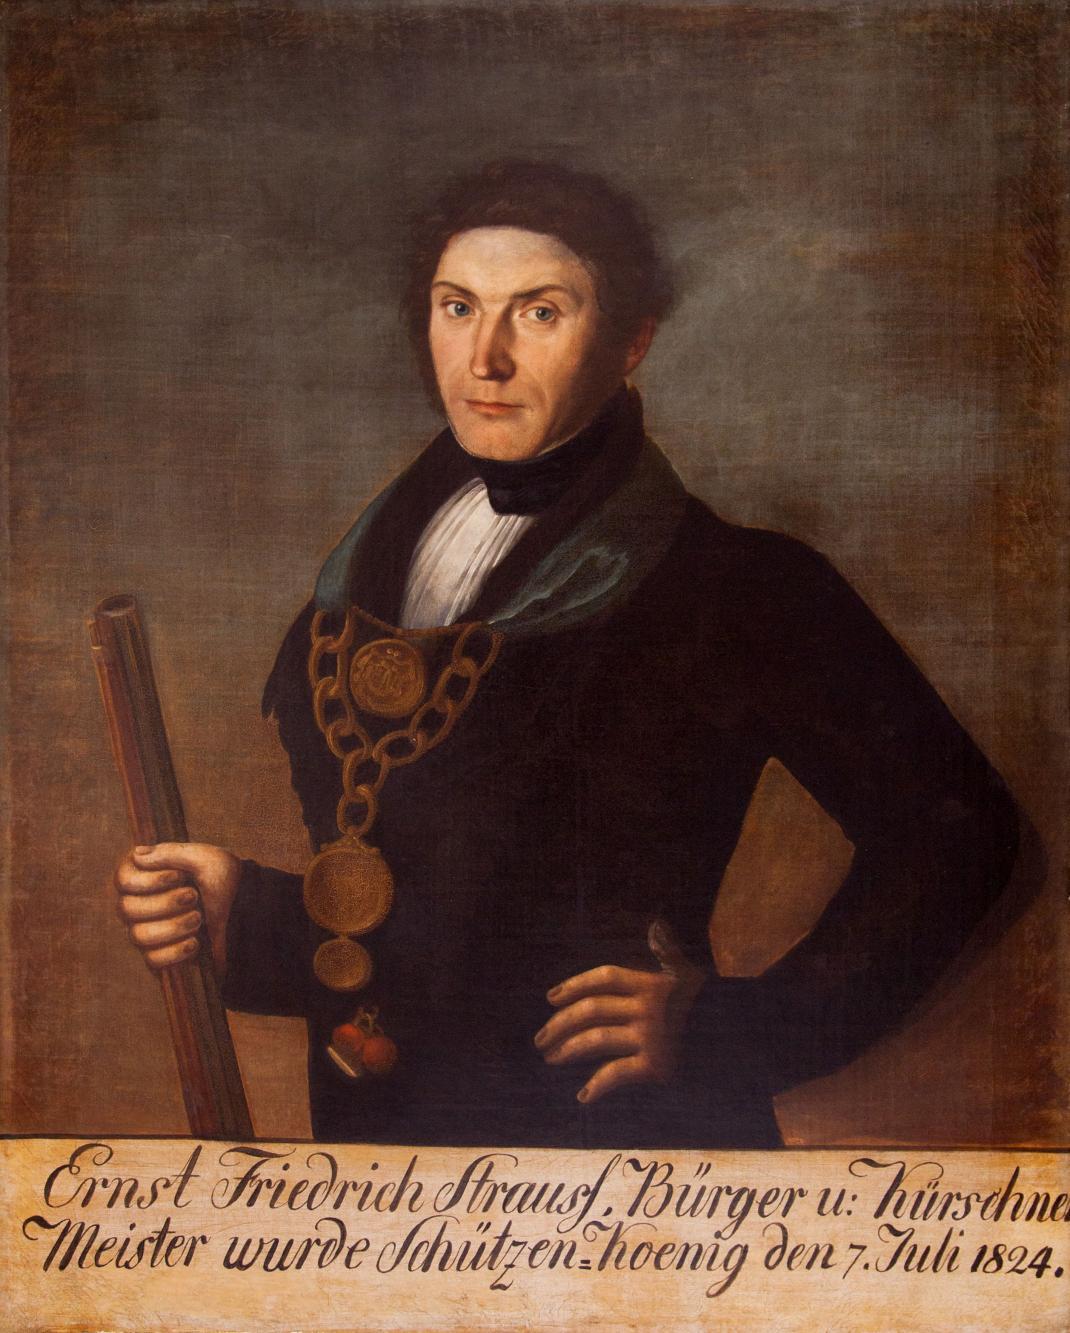 Portret króla kurkowego Ernsta Friedricha Straussa